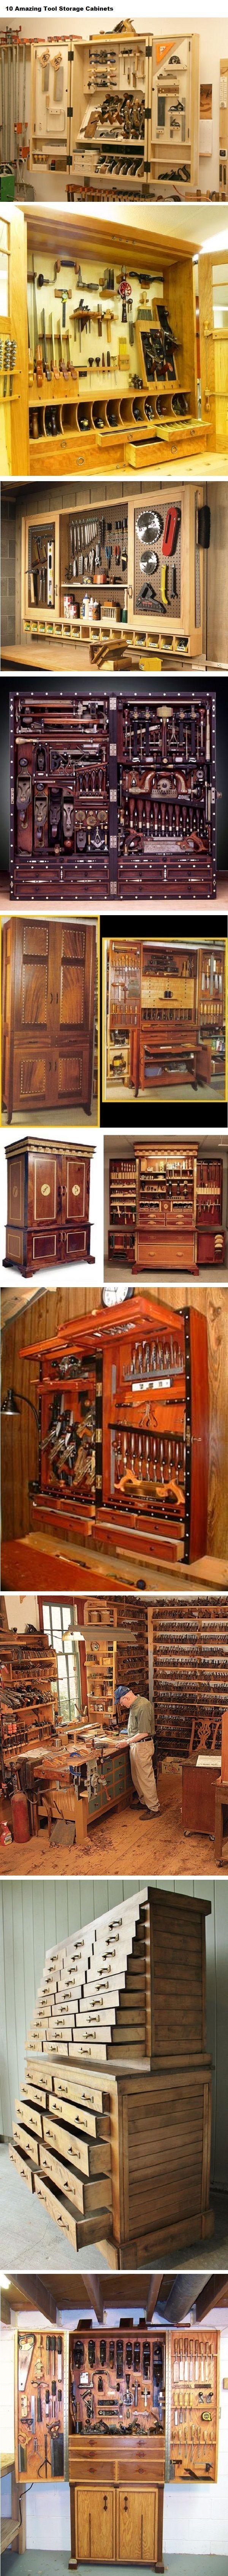 10 Amazing Tool Storage Cabinets. | WoodworkerZ.com